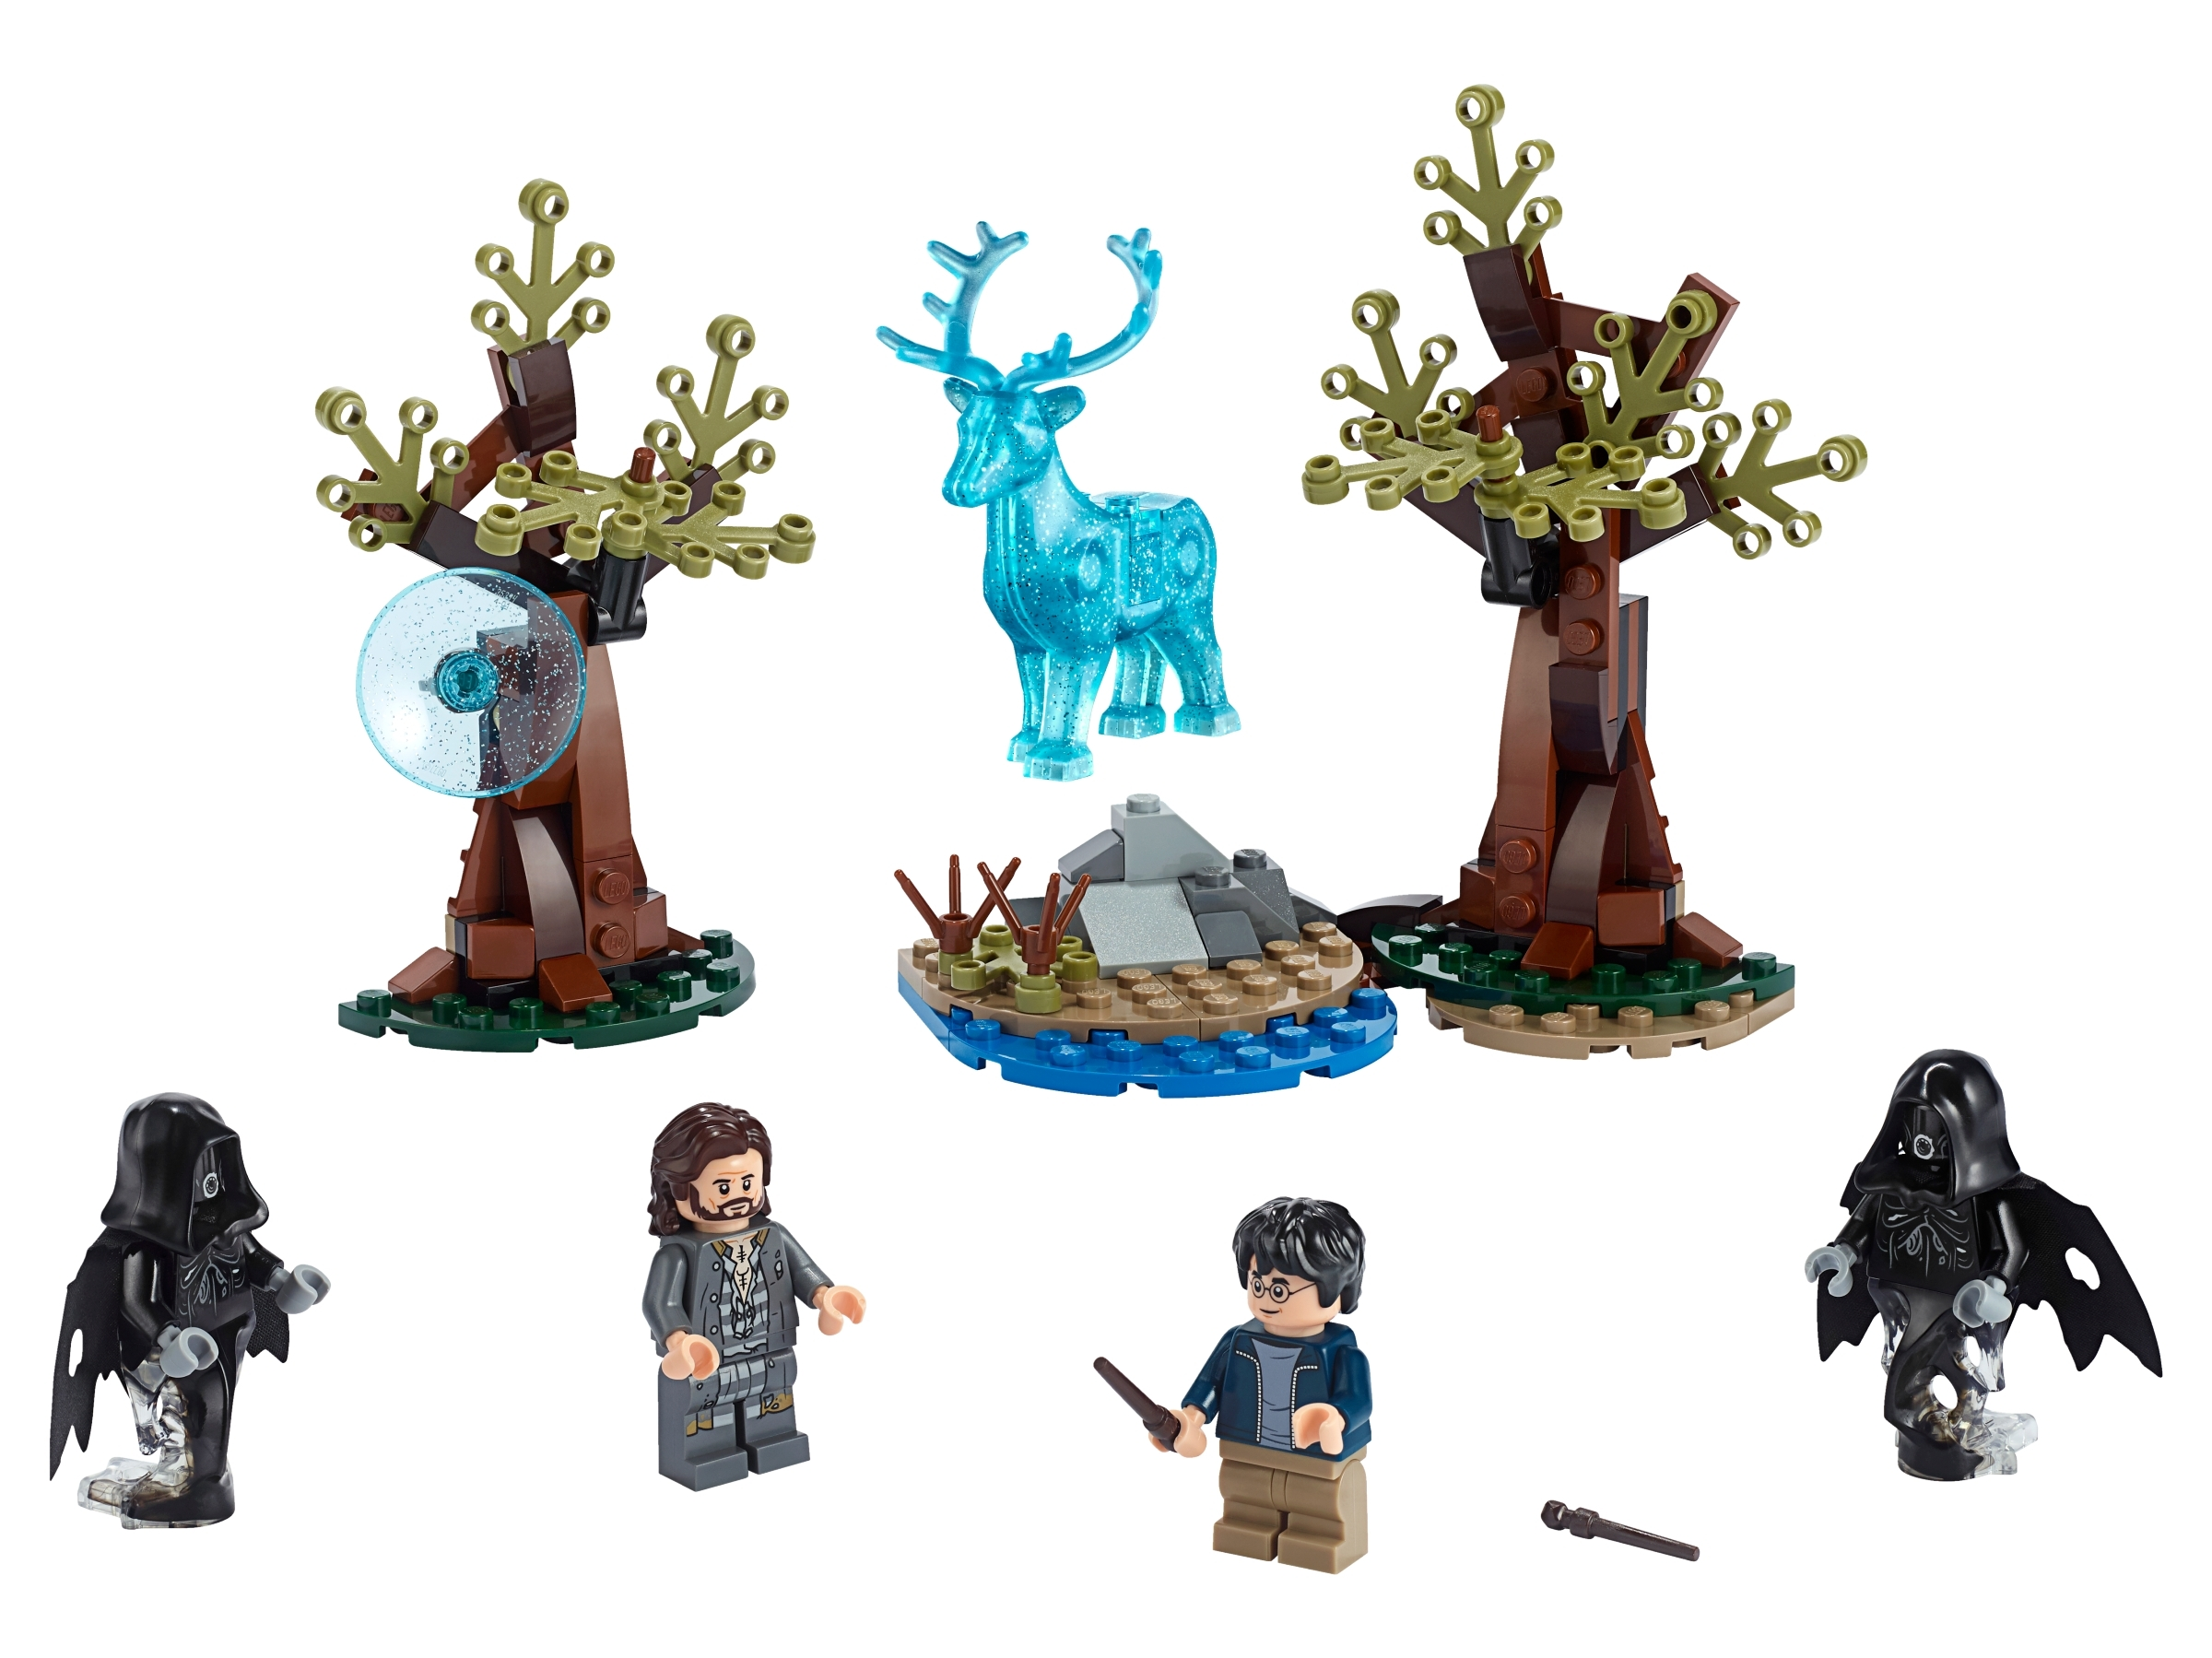 Lego 75945 Harry Potter Figure Patronus stag Expecto Patronum New